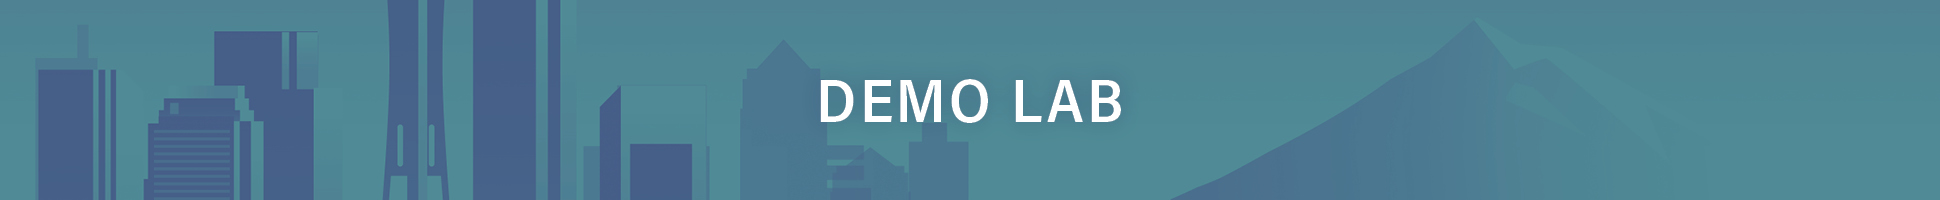 demo lab